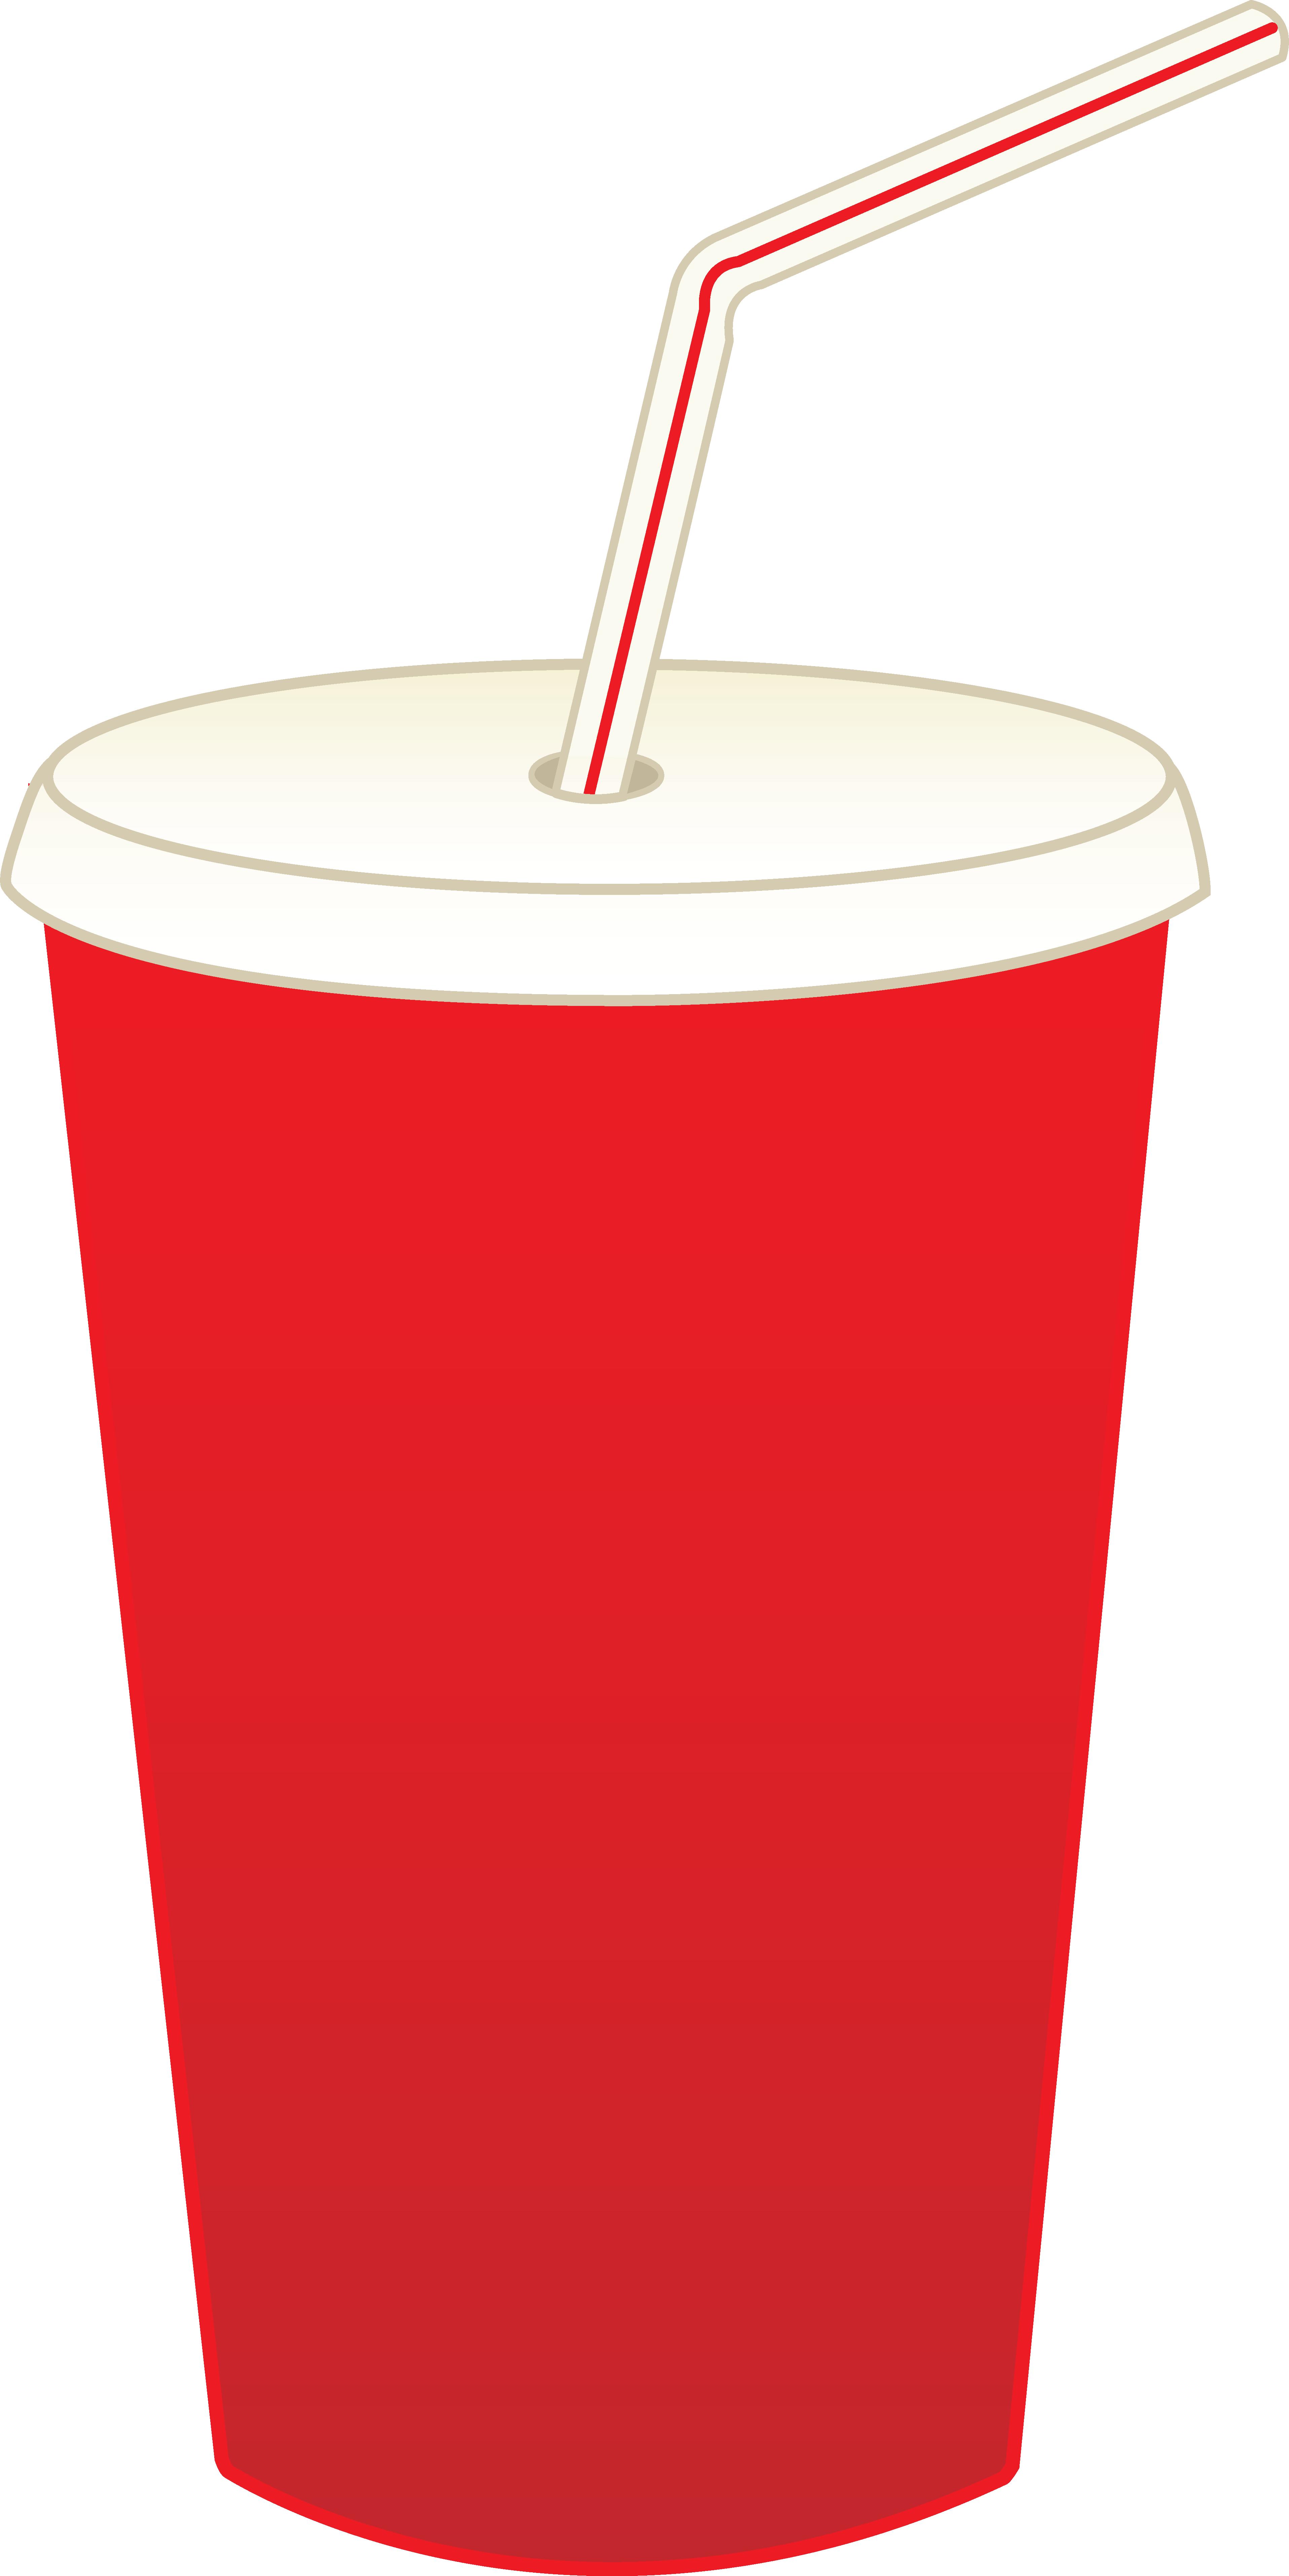 Clipart soda drink.